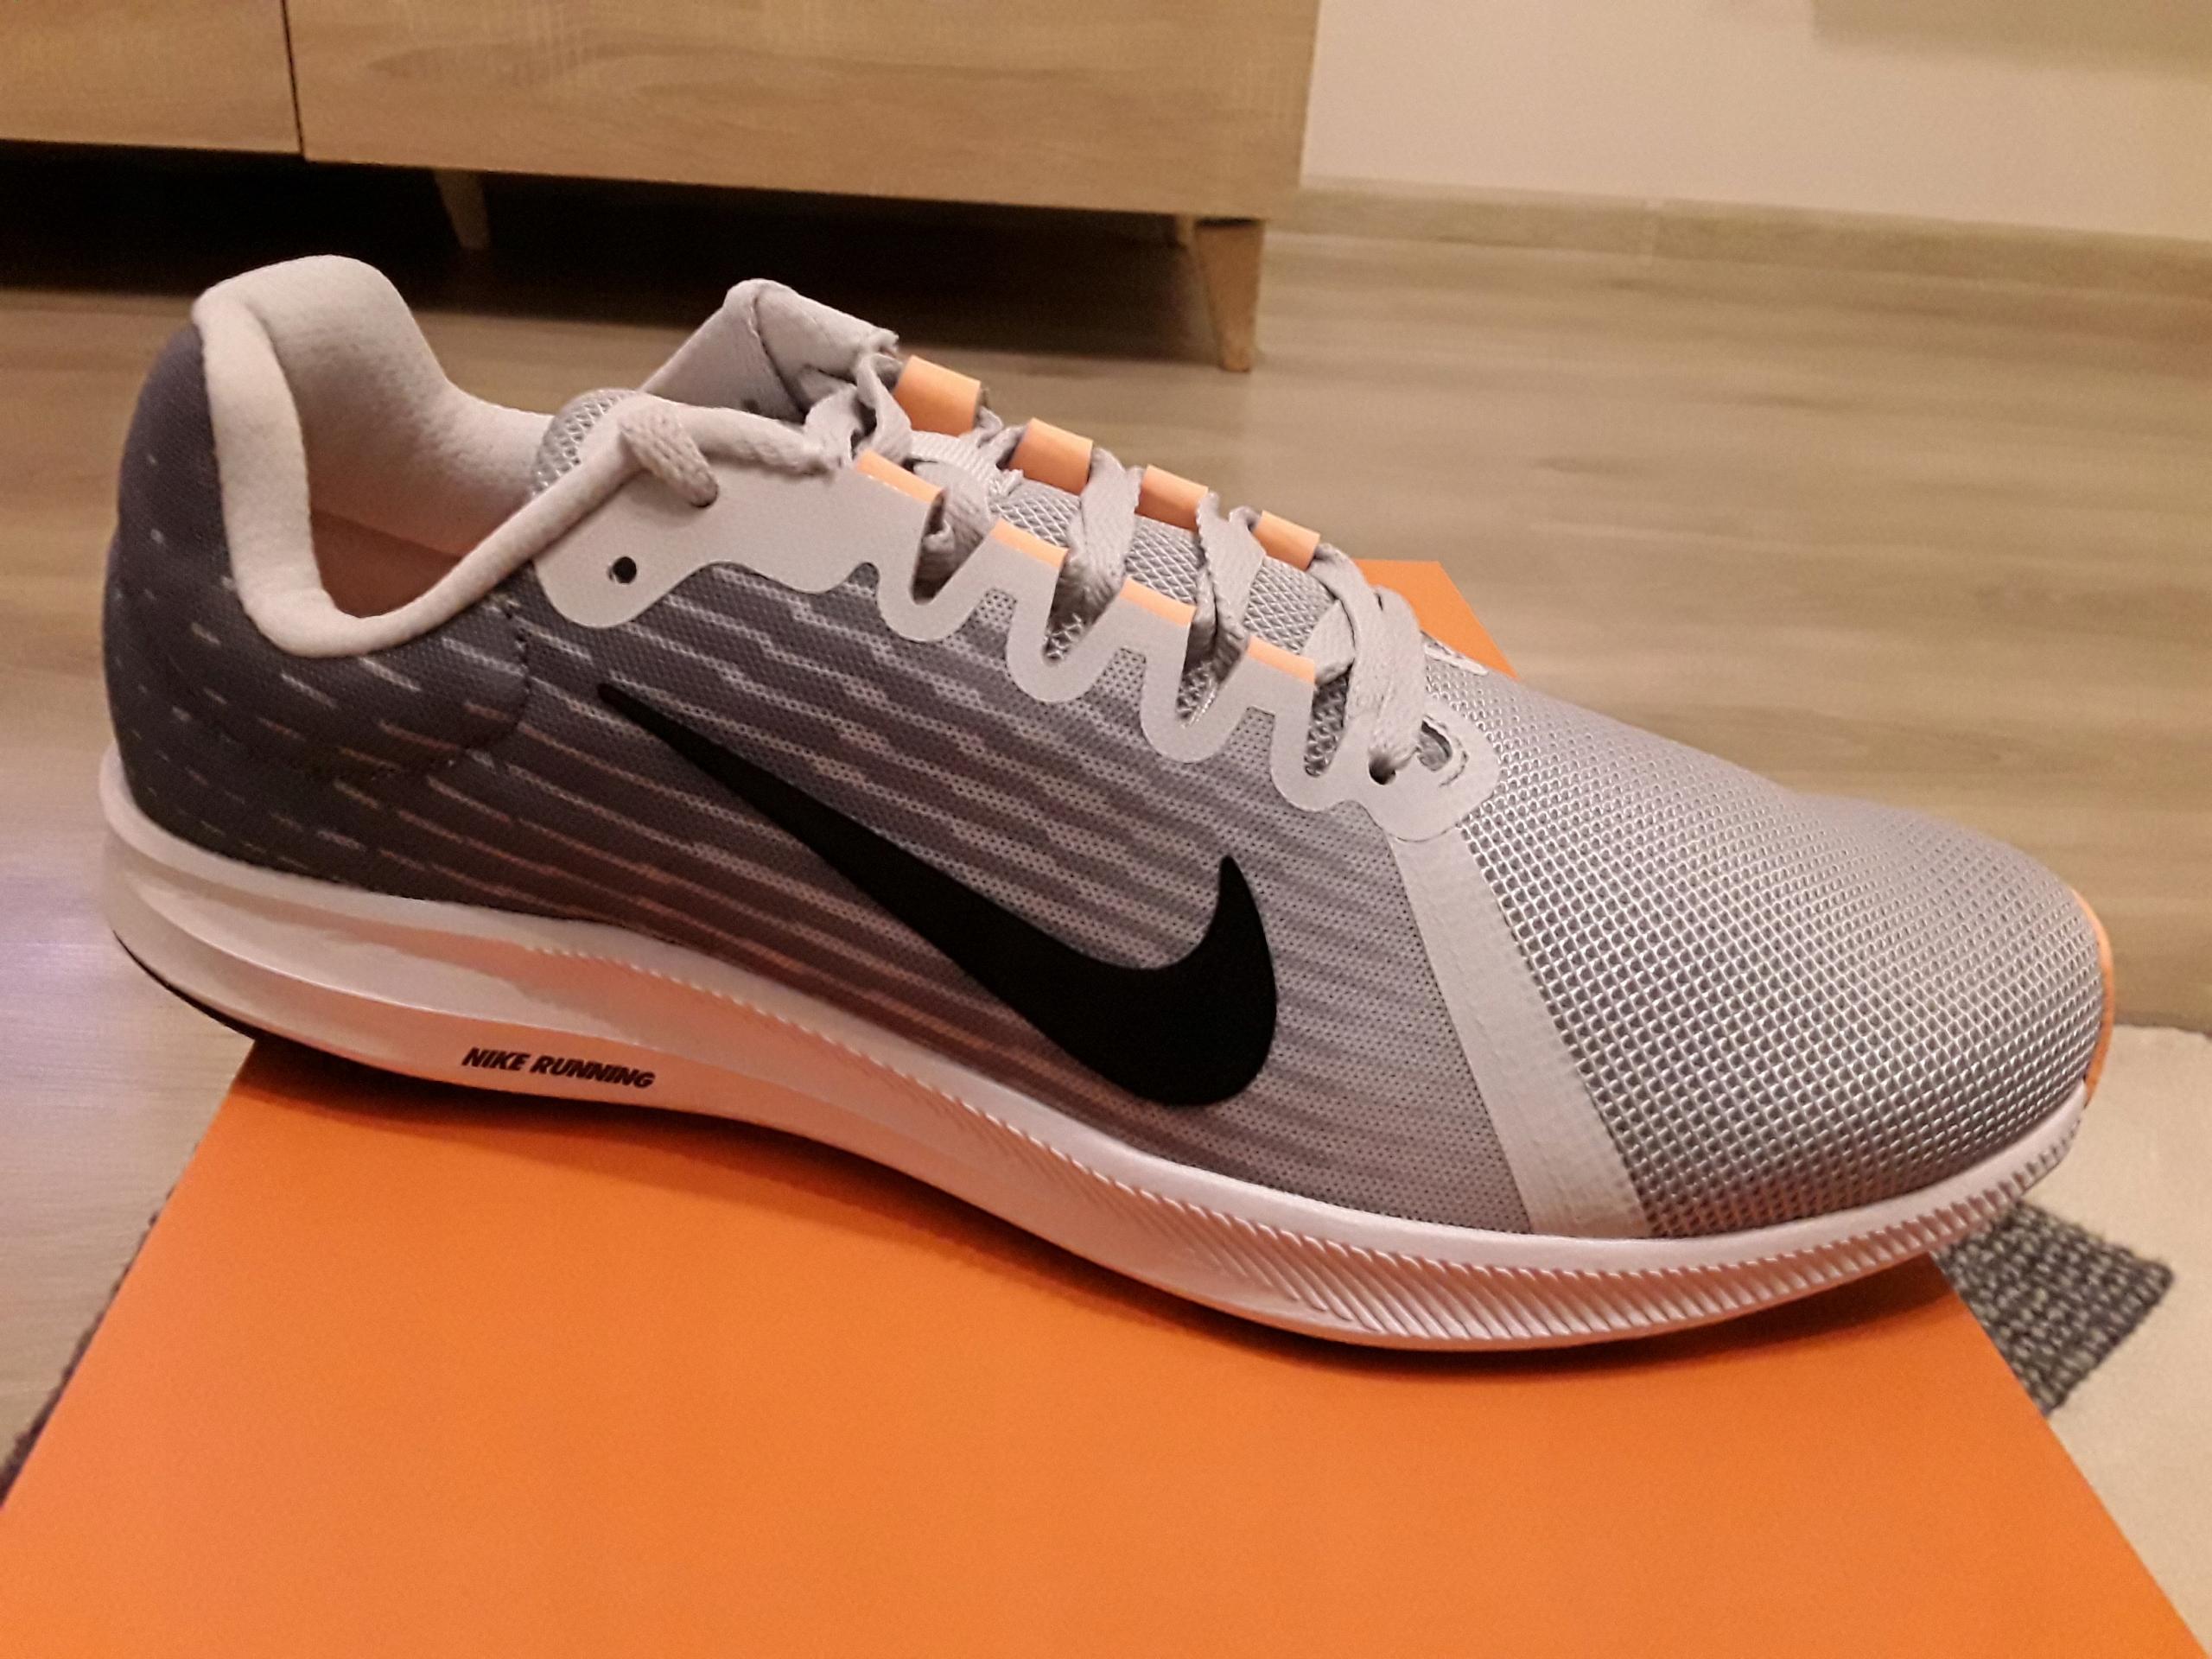 41fe1d56 Damskie buty Nike Downshifter 8 rozmiar 42 908994 - 7690974704 ...